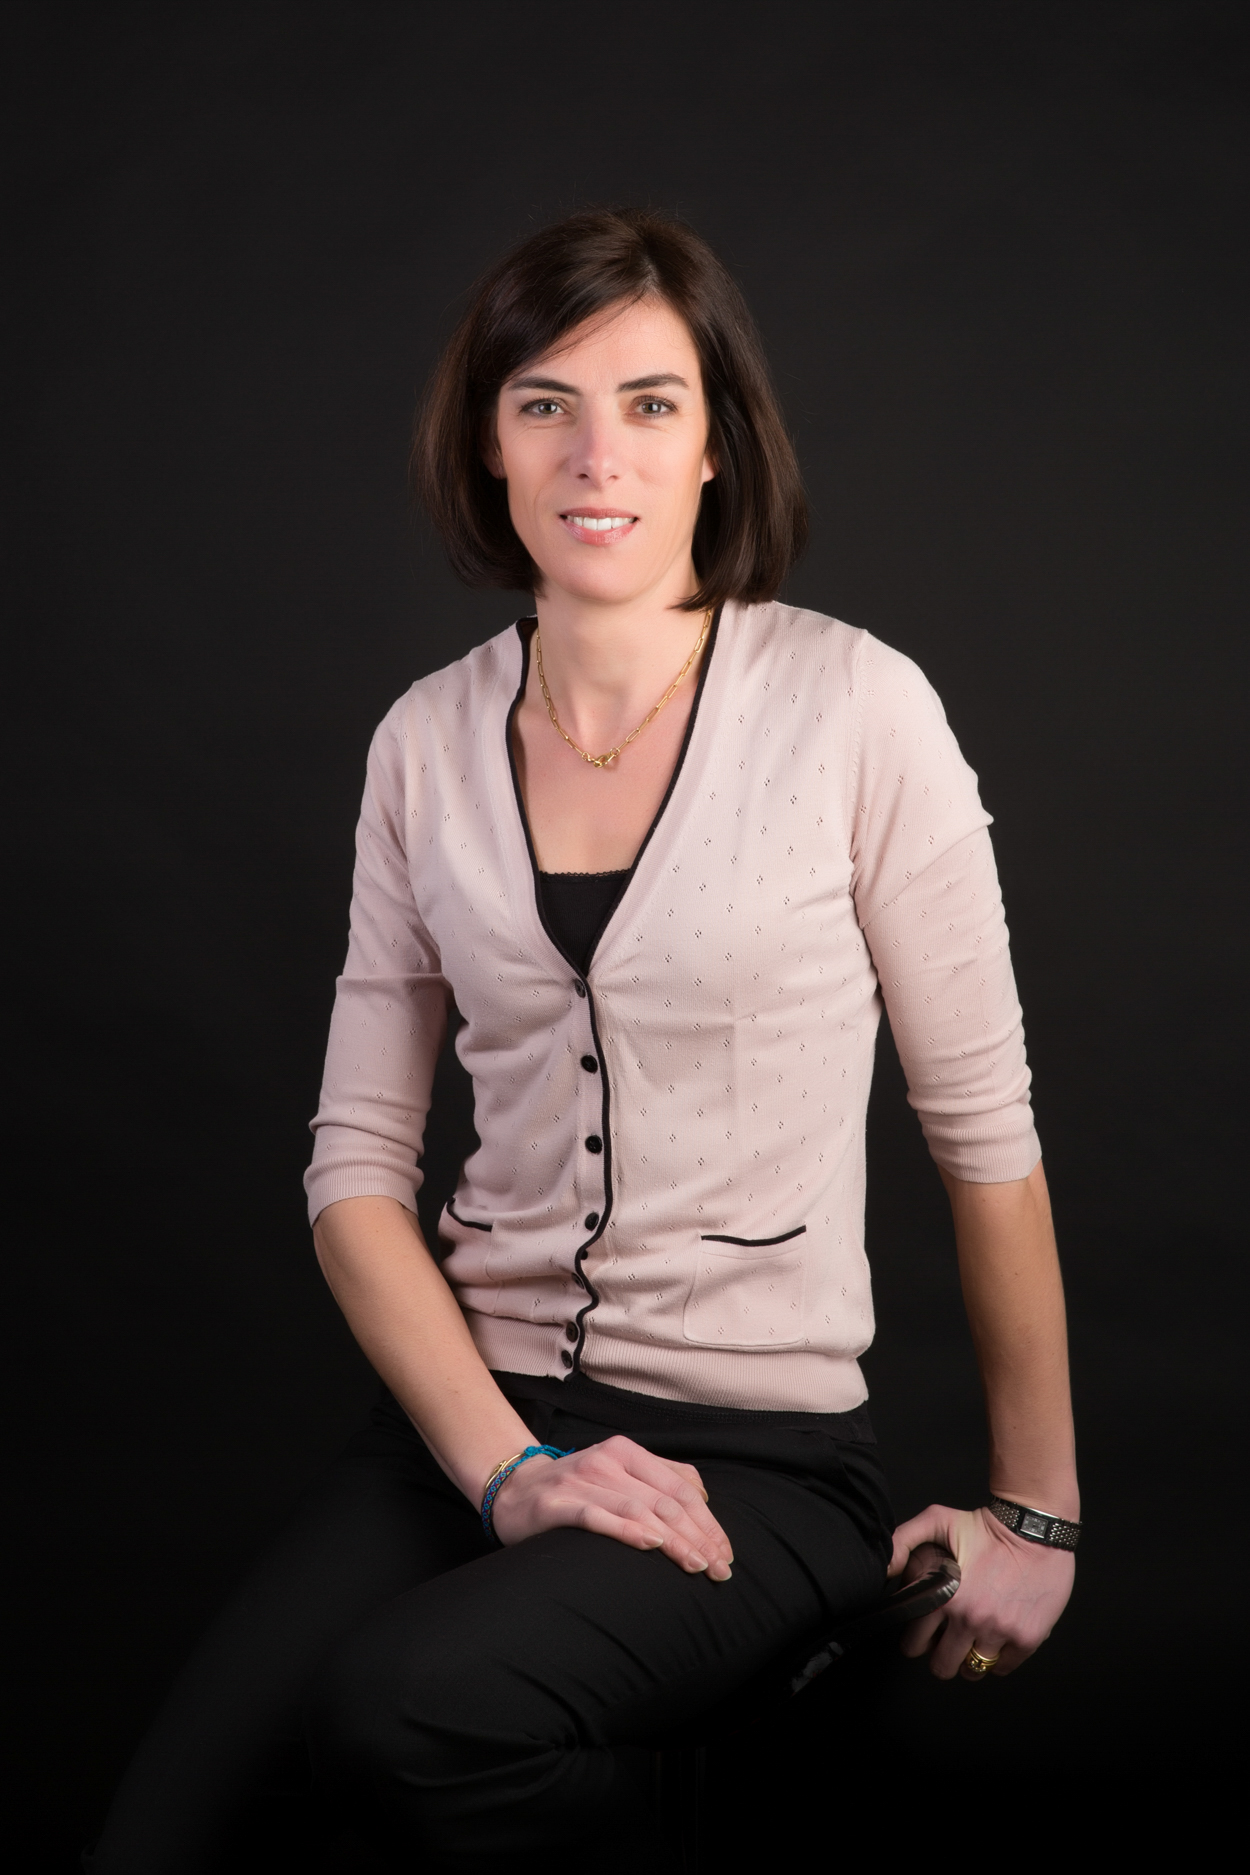 portrait-studio-photo-professionnelle-gaellebc-entreprise-37-jpgweb-020